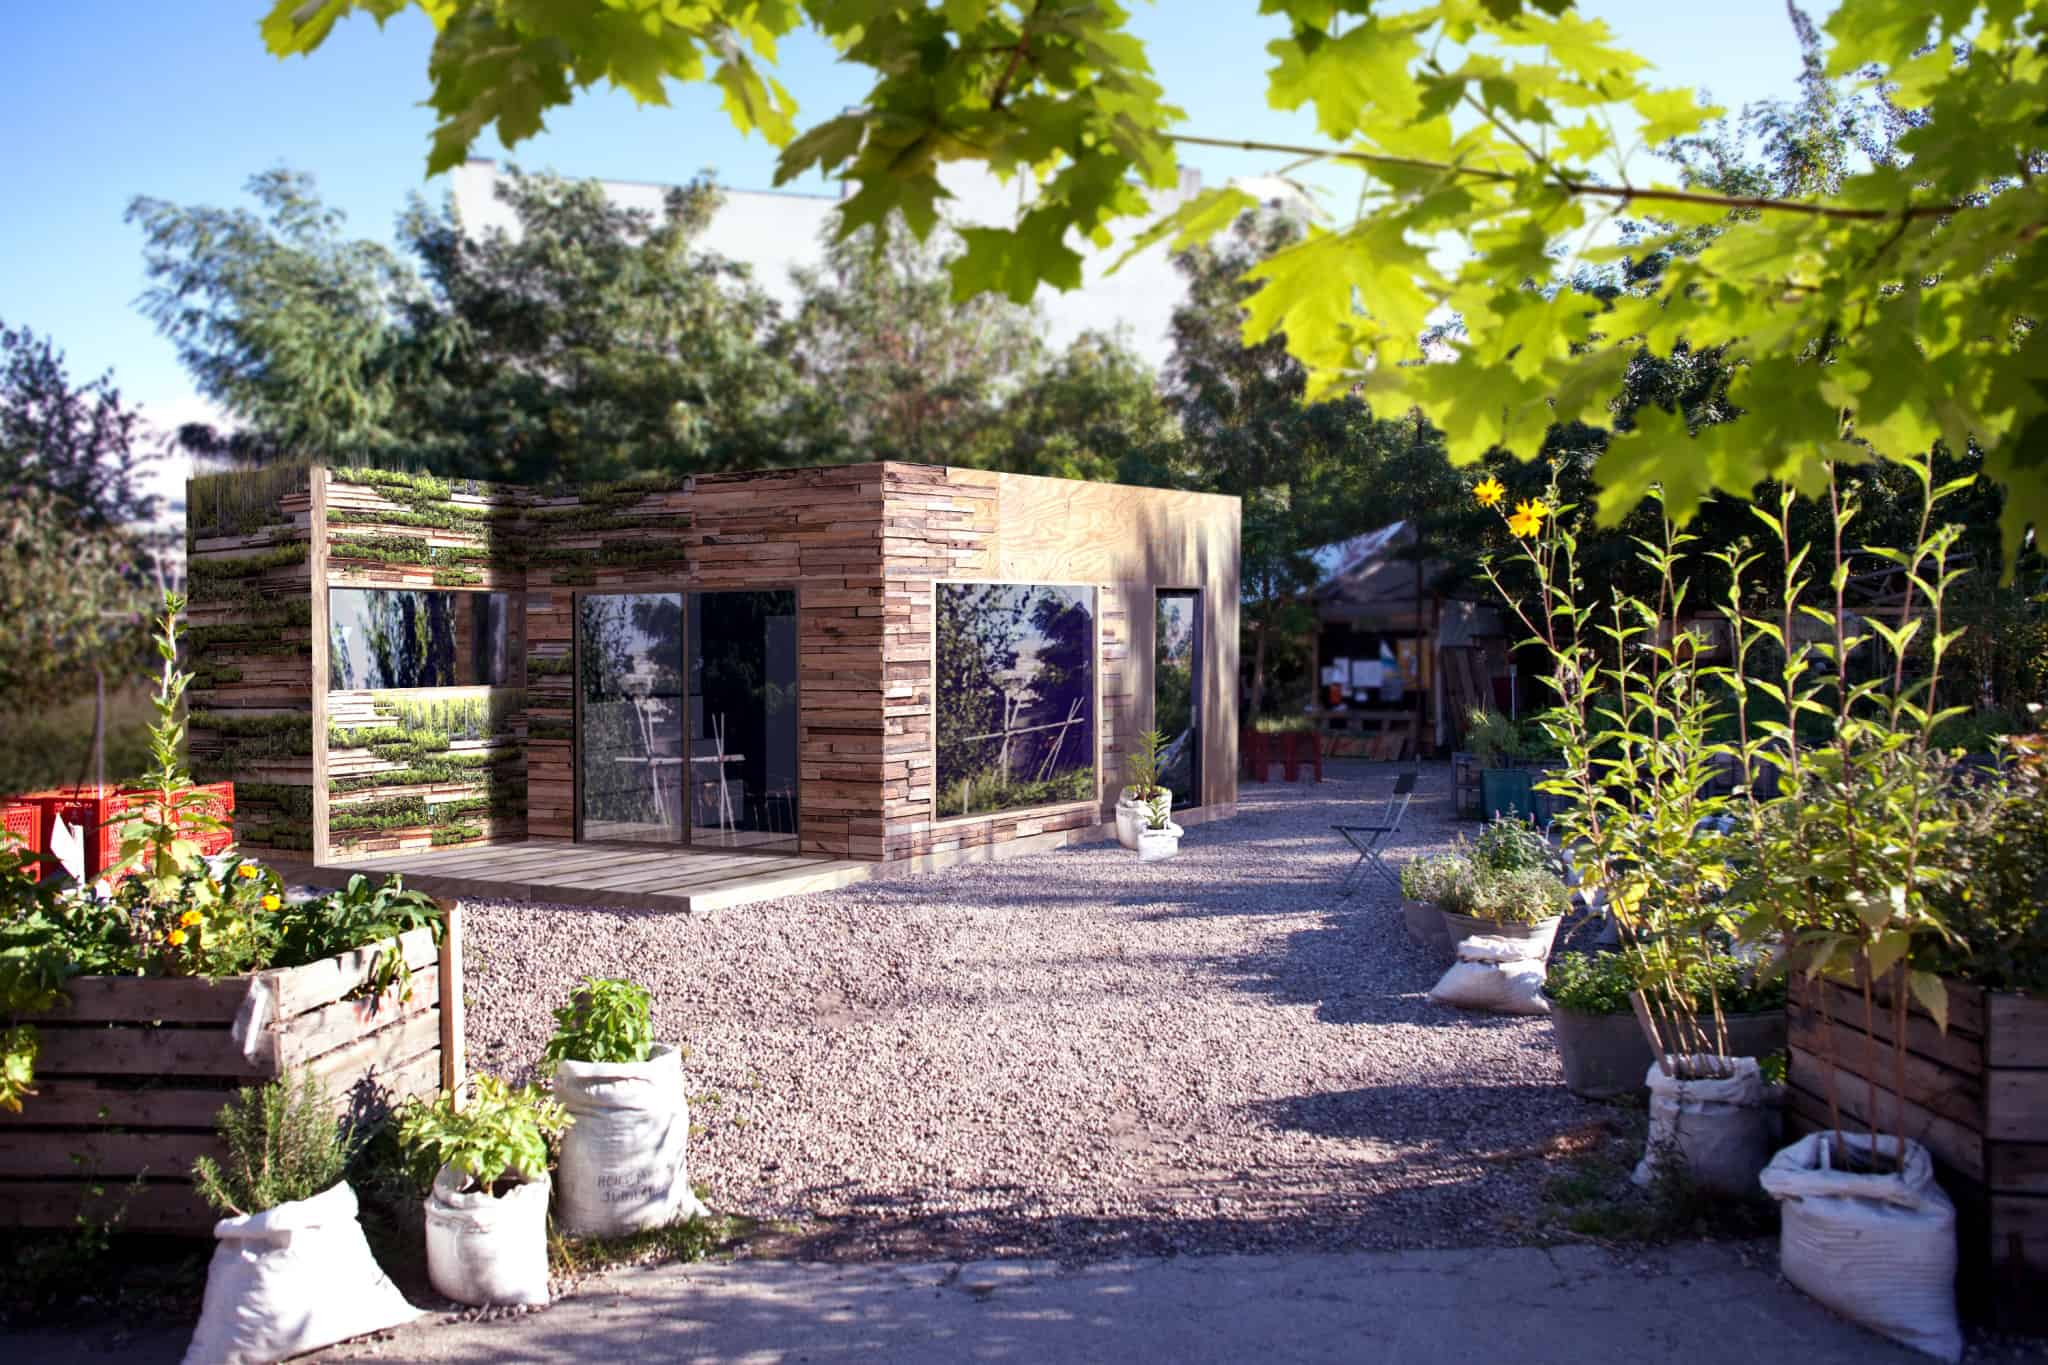 Tiny Haus House Projekt Berlin